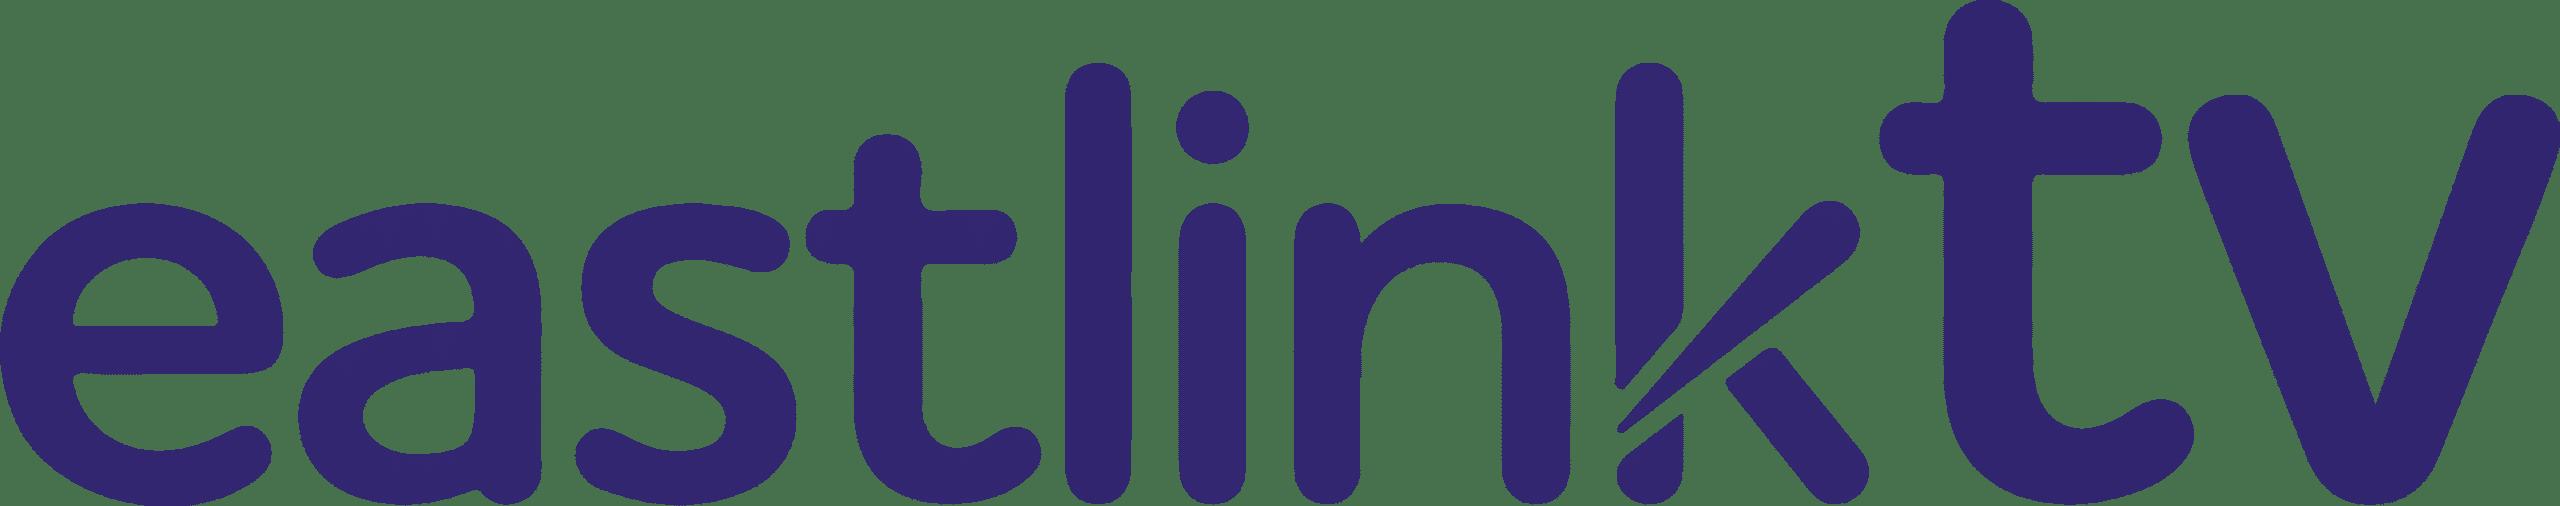 eastlink company logo